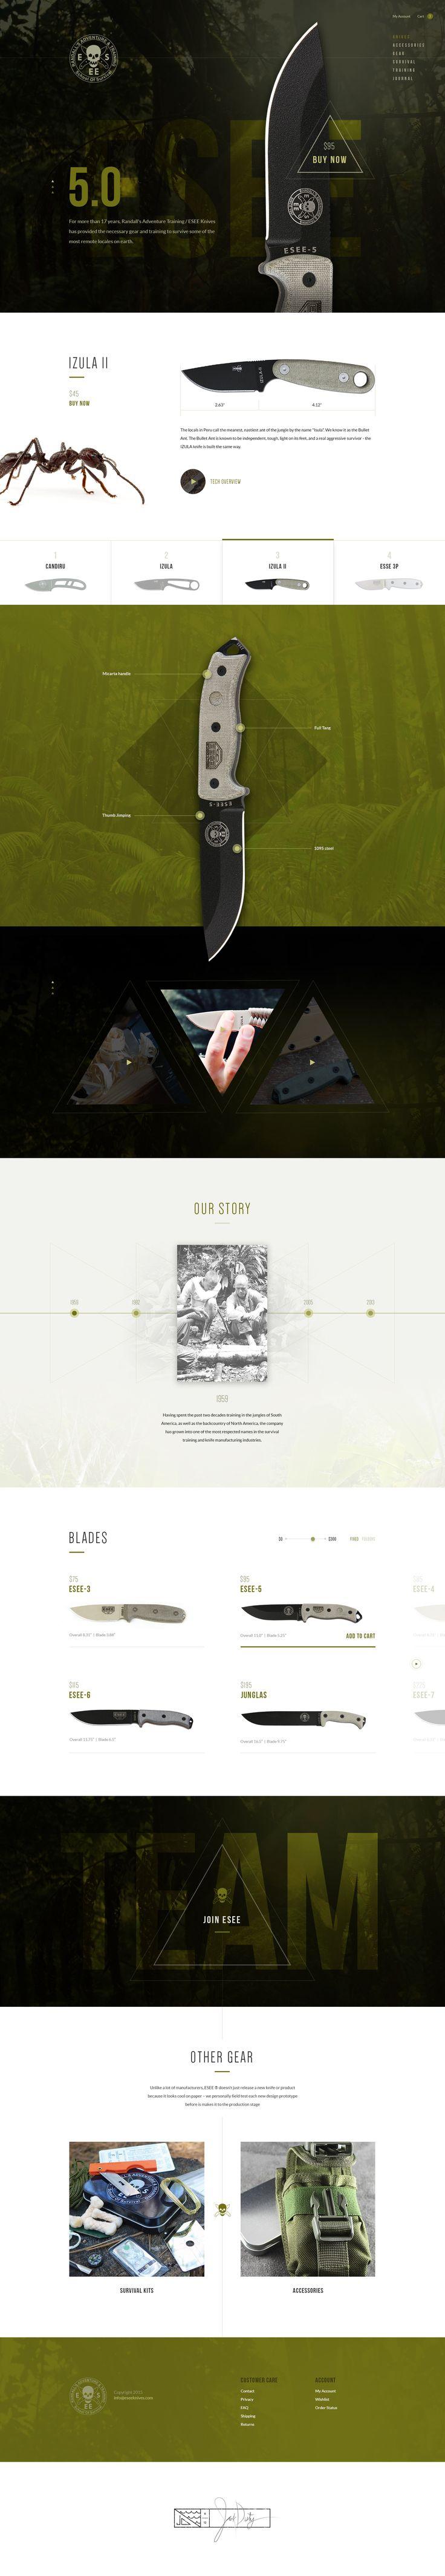 Esee by Ben Johnson knife brand website design